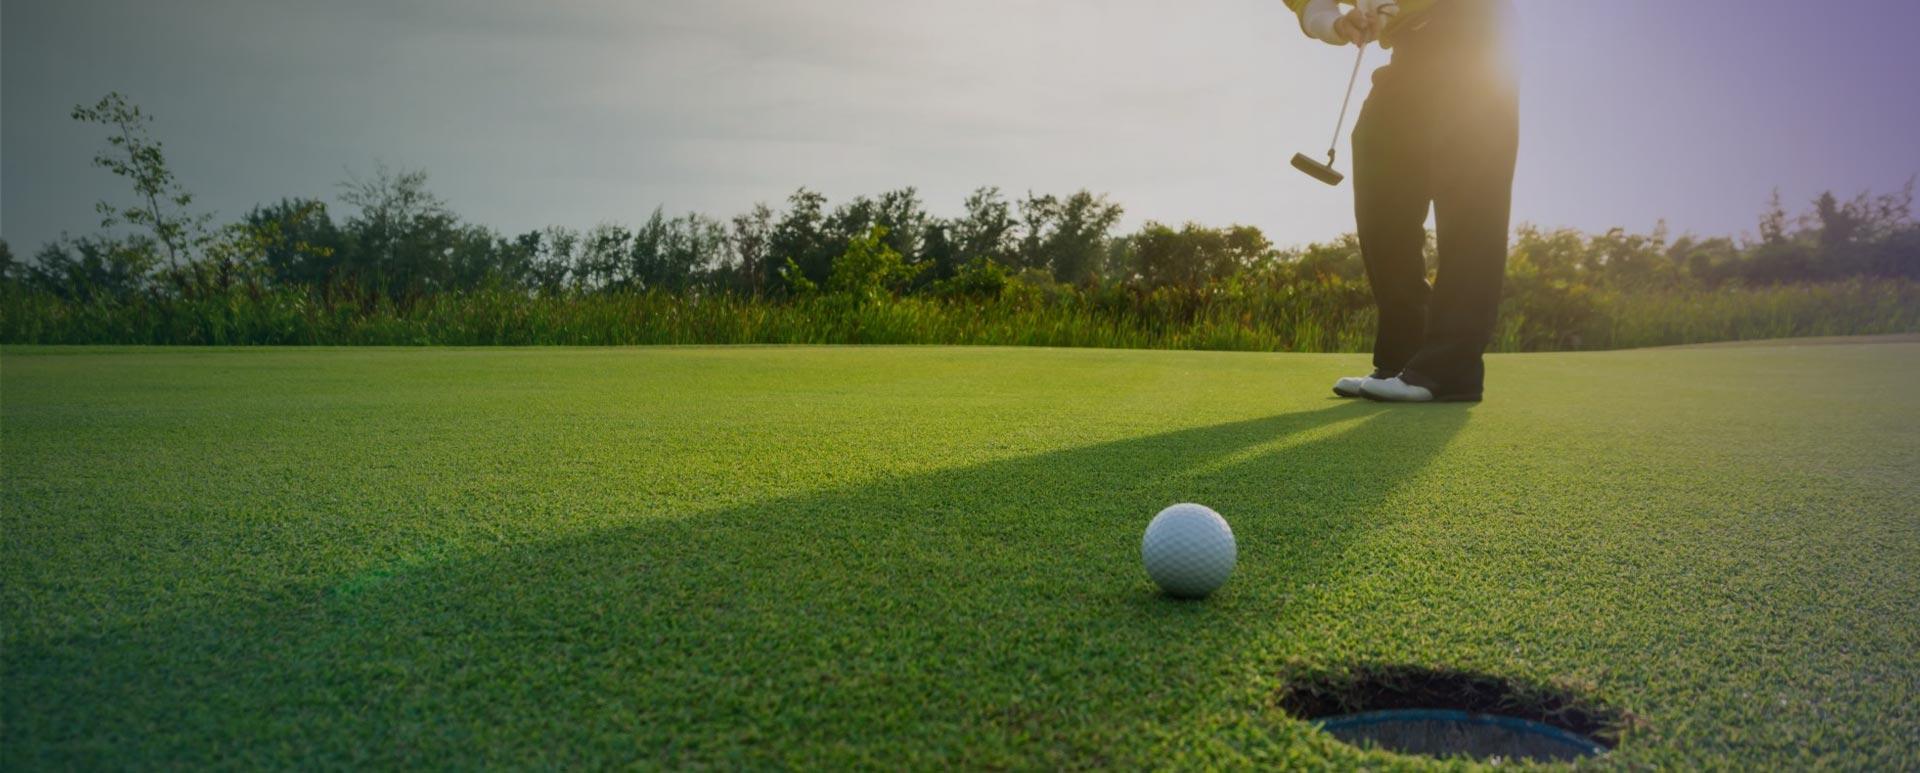 carrelli-da-golf-quale-scegliere